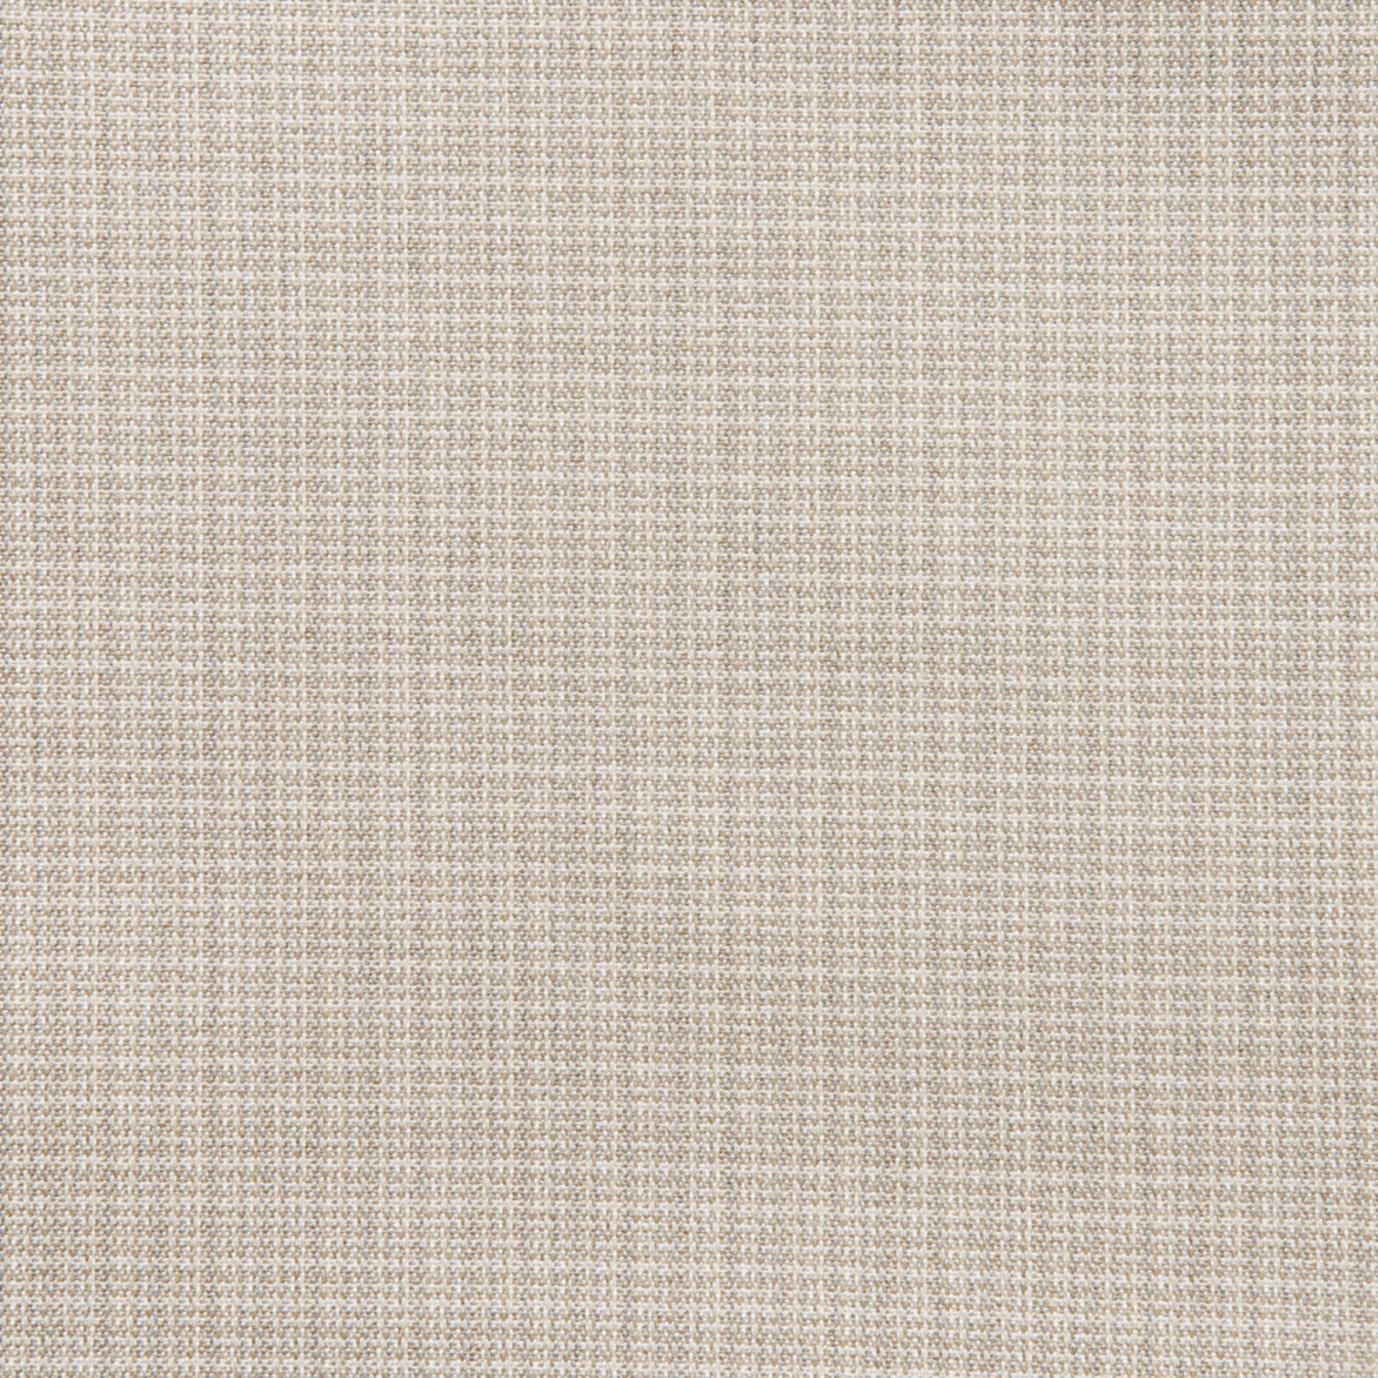 Milo™ Gray Ottomans - Slate Gray